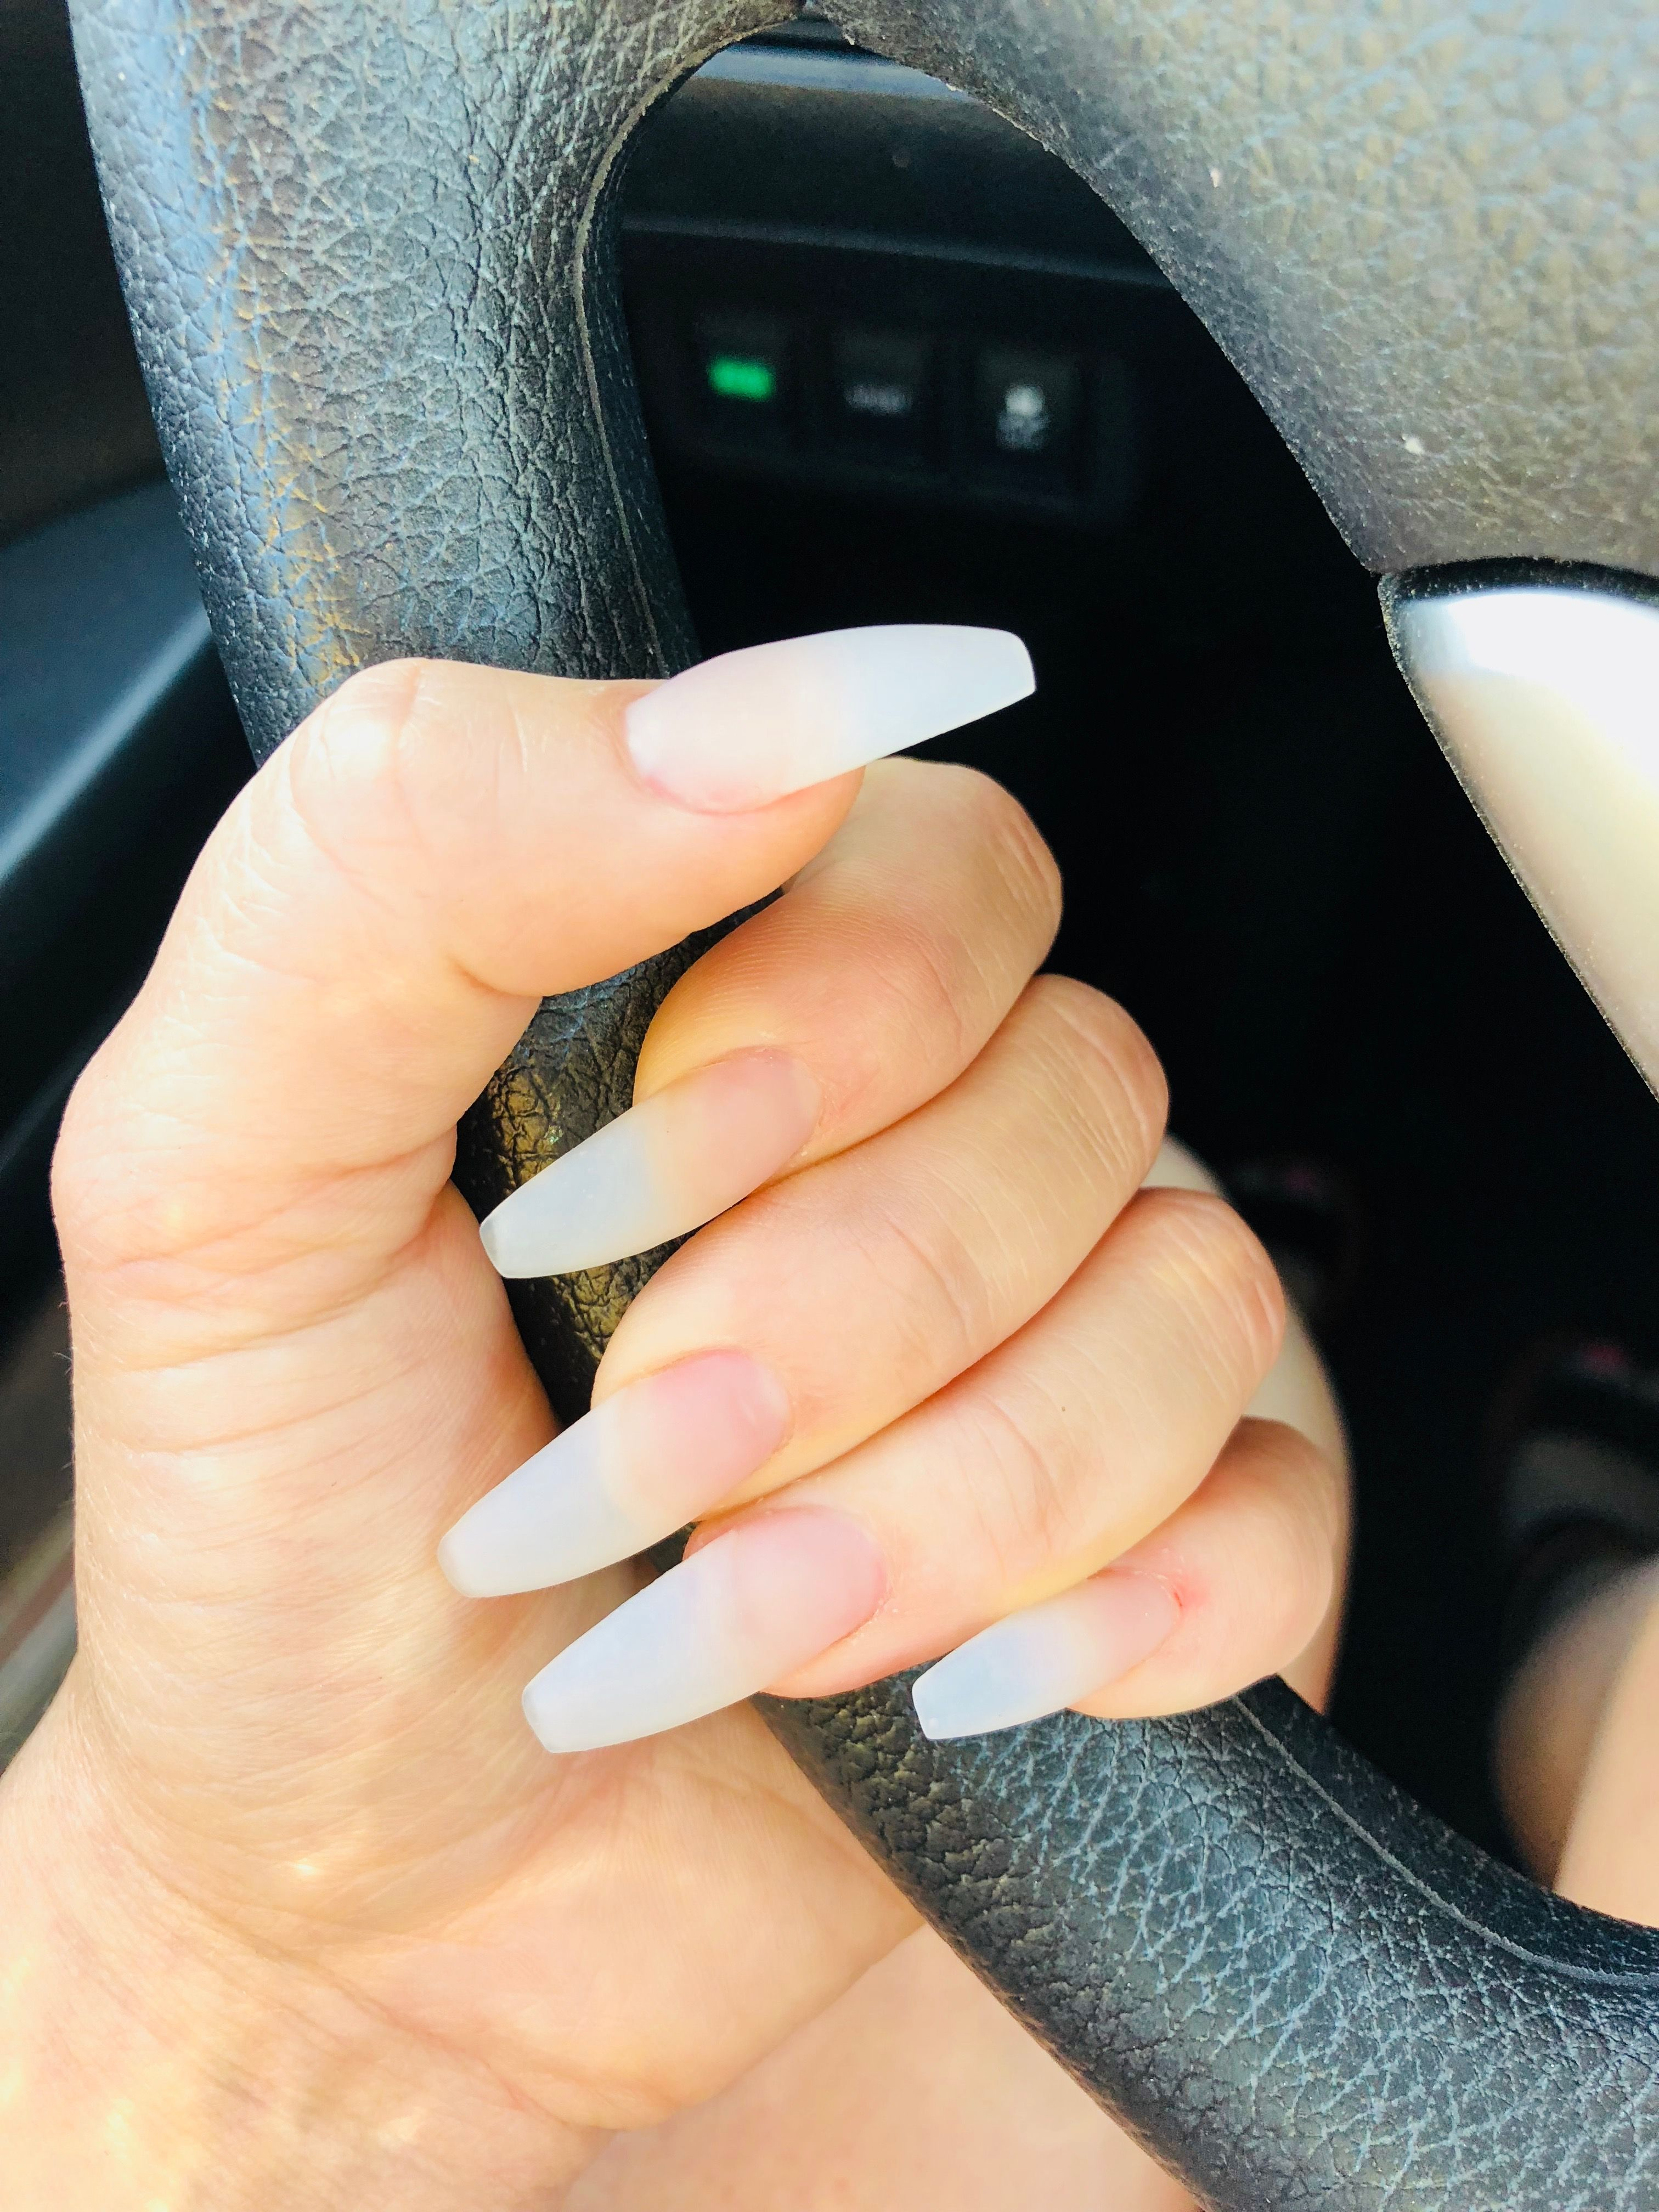 Pinterest Tkmaignan For More Inspiration Natural Acrylic Nails Matte Nails Design Matte Acrylic Nails